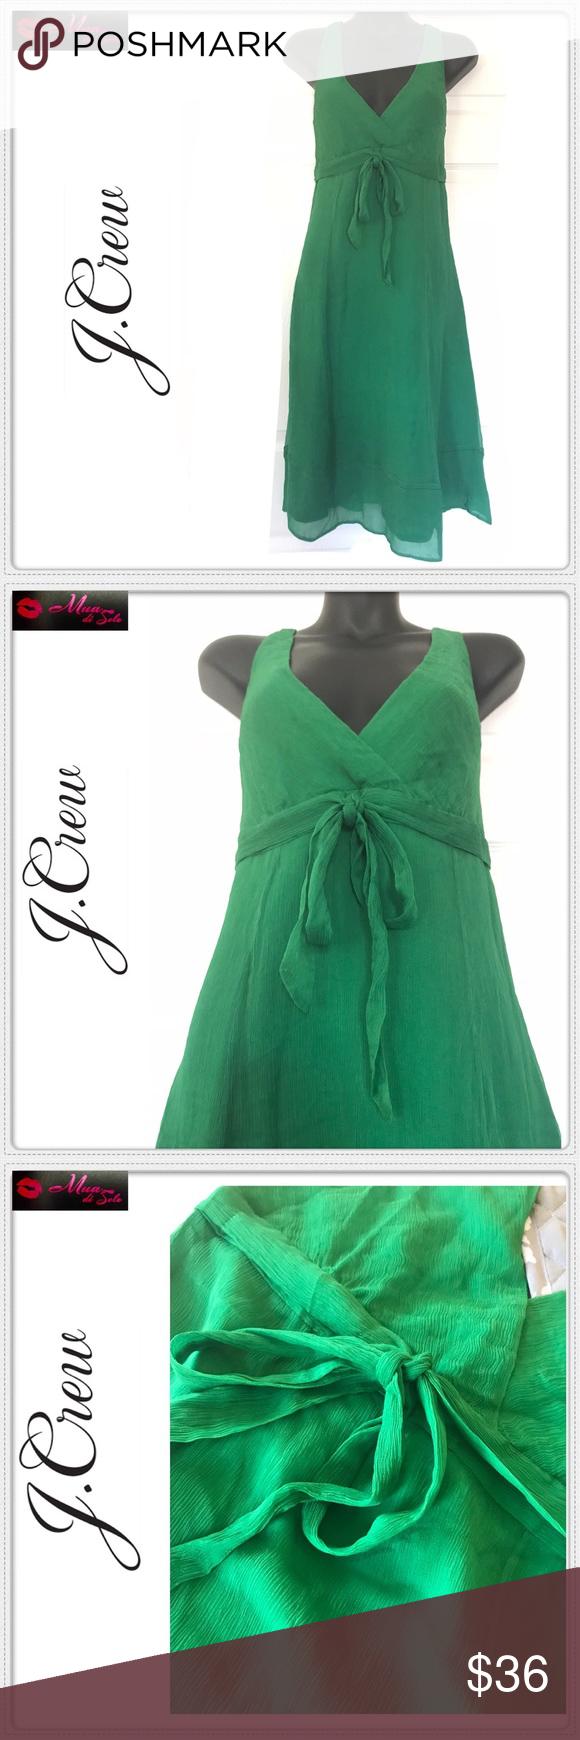 Green dress v neck  J CREW  SILK EMERALD GREEN DRESS Beautiful and classy Vneck